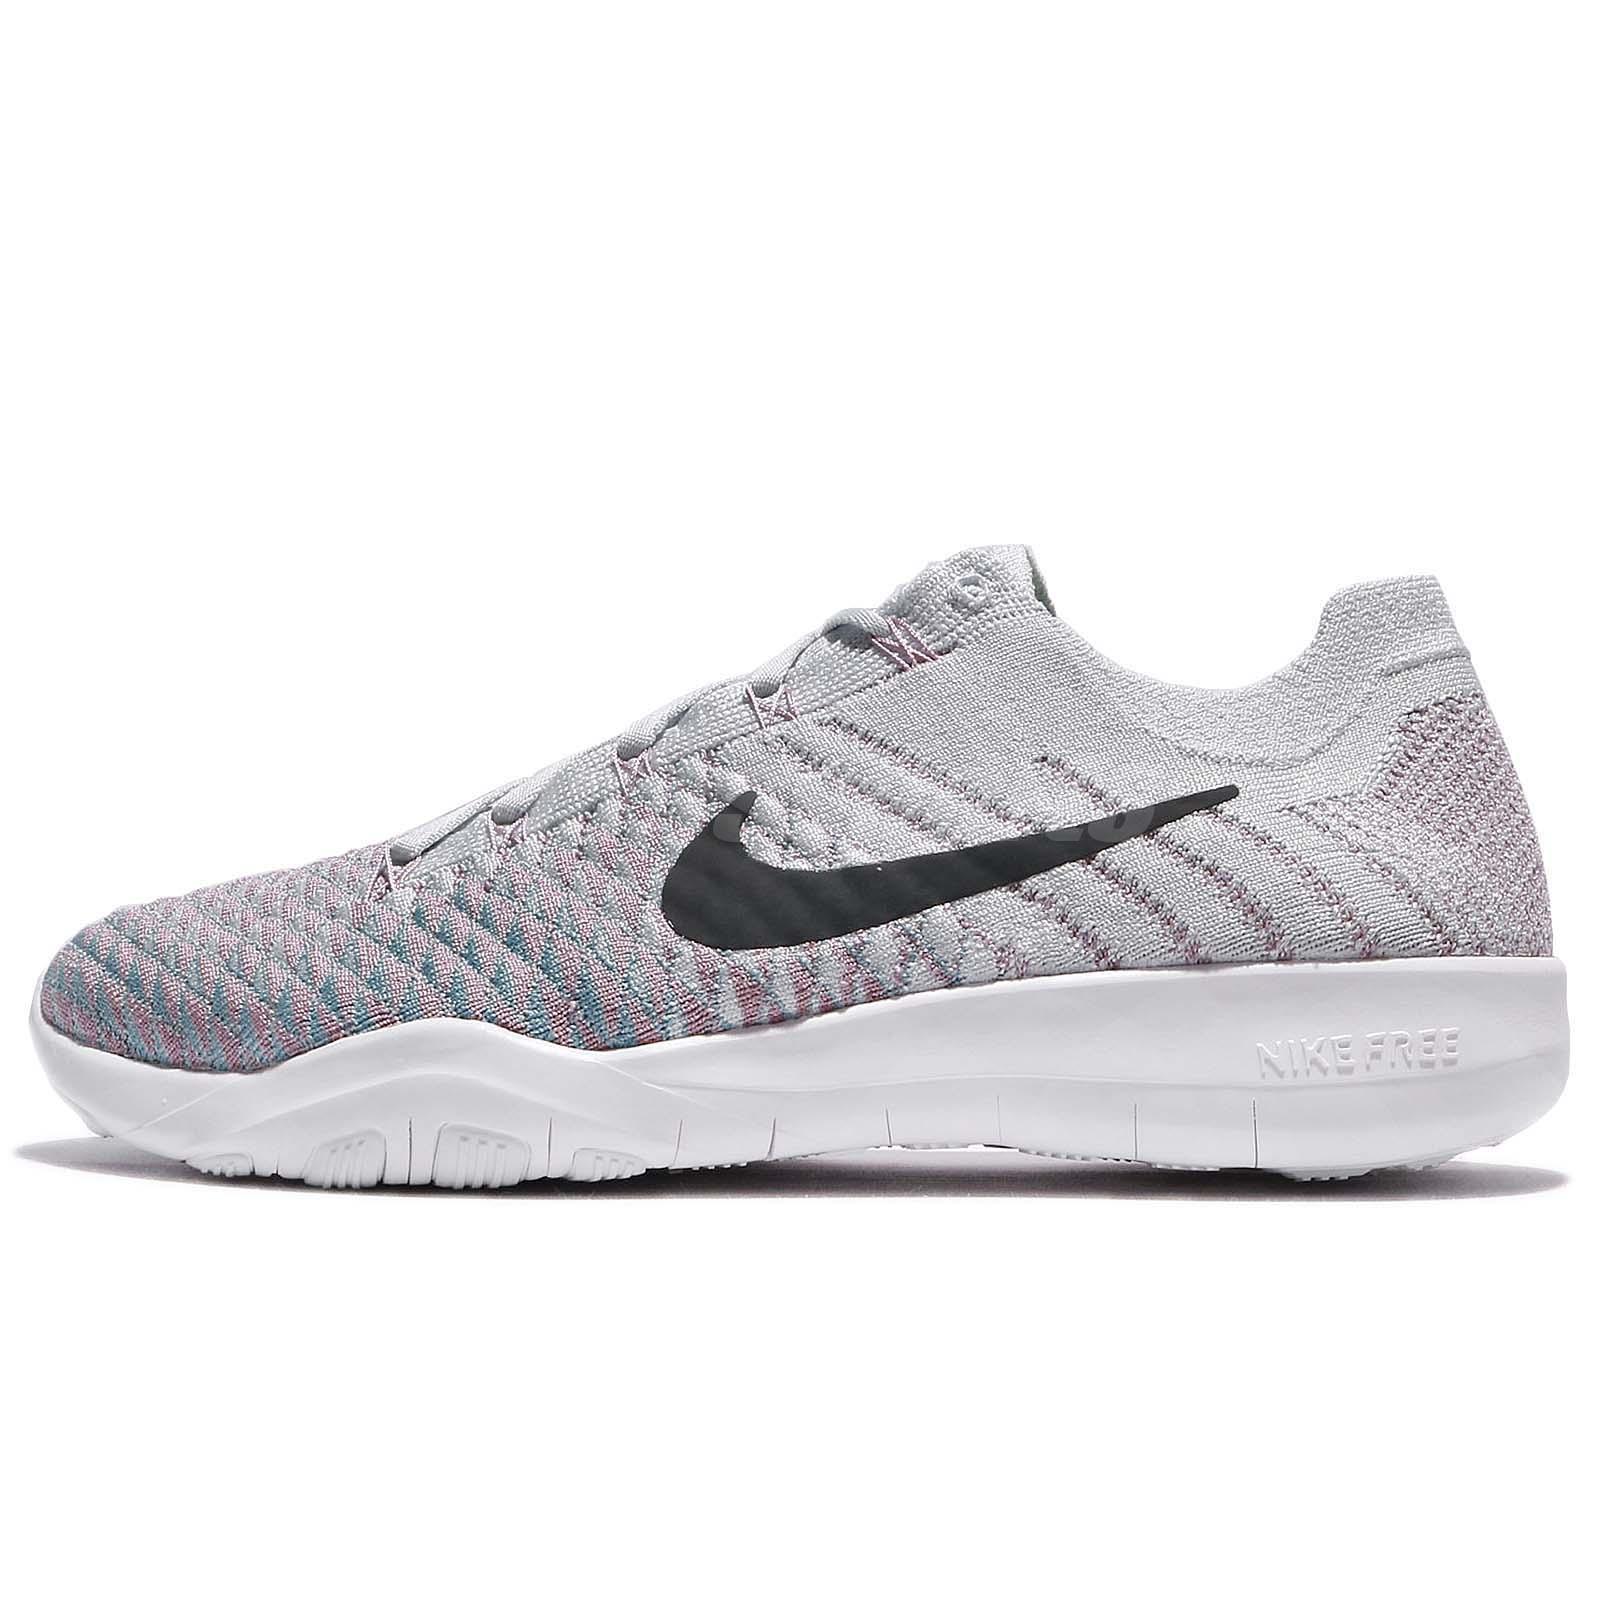 aa466dc9b6a5 Nike Wmns Free TR Flyknit 2 II Pure Platinum Women Training Shoes 904658-009